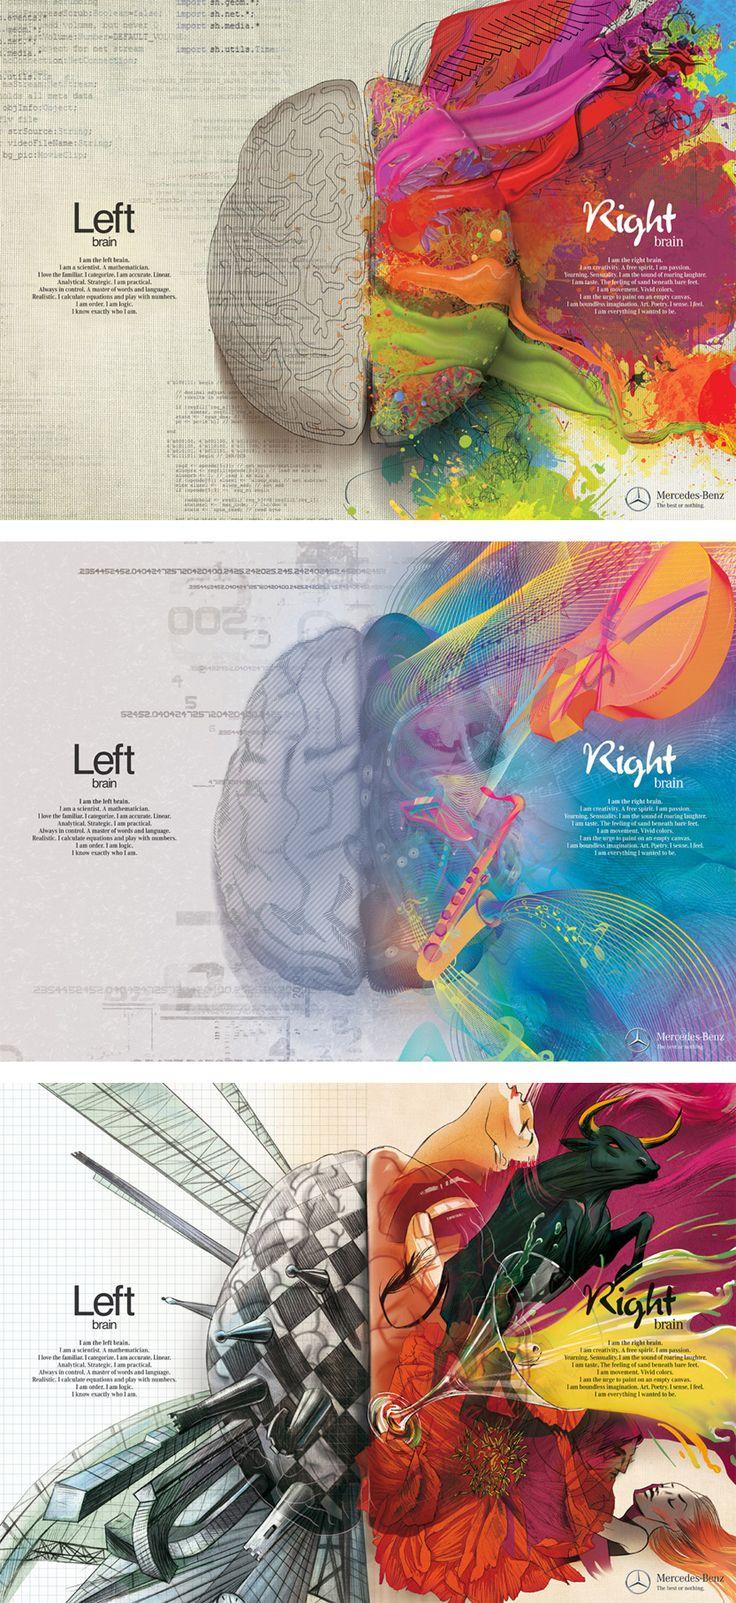 Mercedes Benz: Left Brain - Right Brain, Paint/Music/Passion